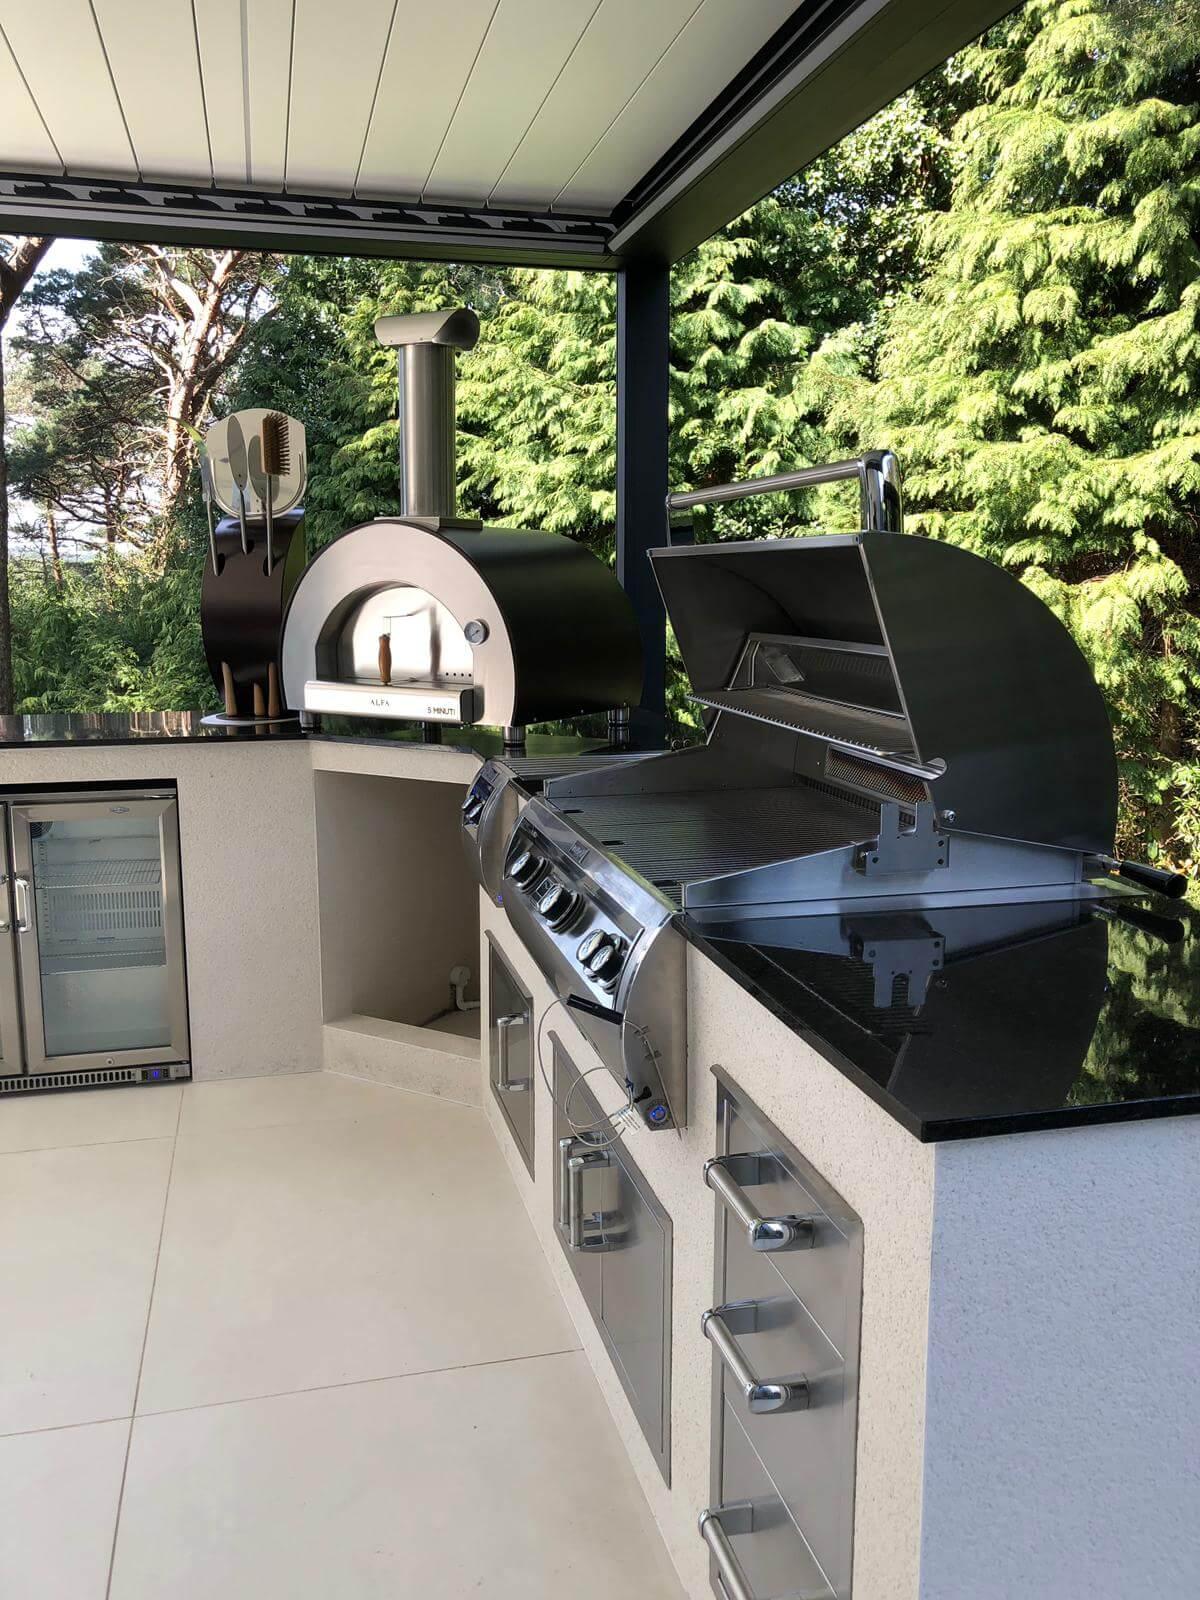 aos-kitchen-alfa-forni-pizza-oven